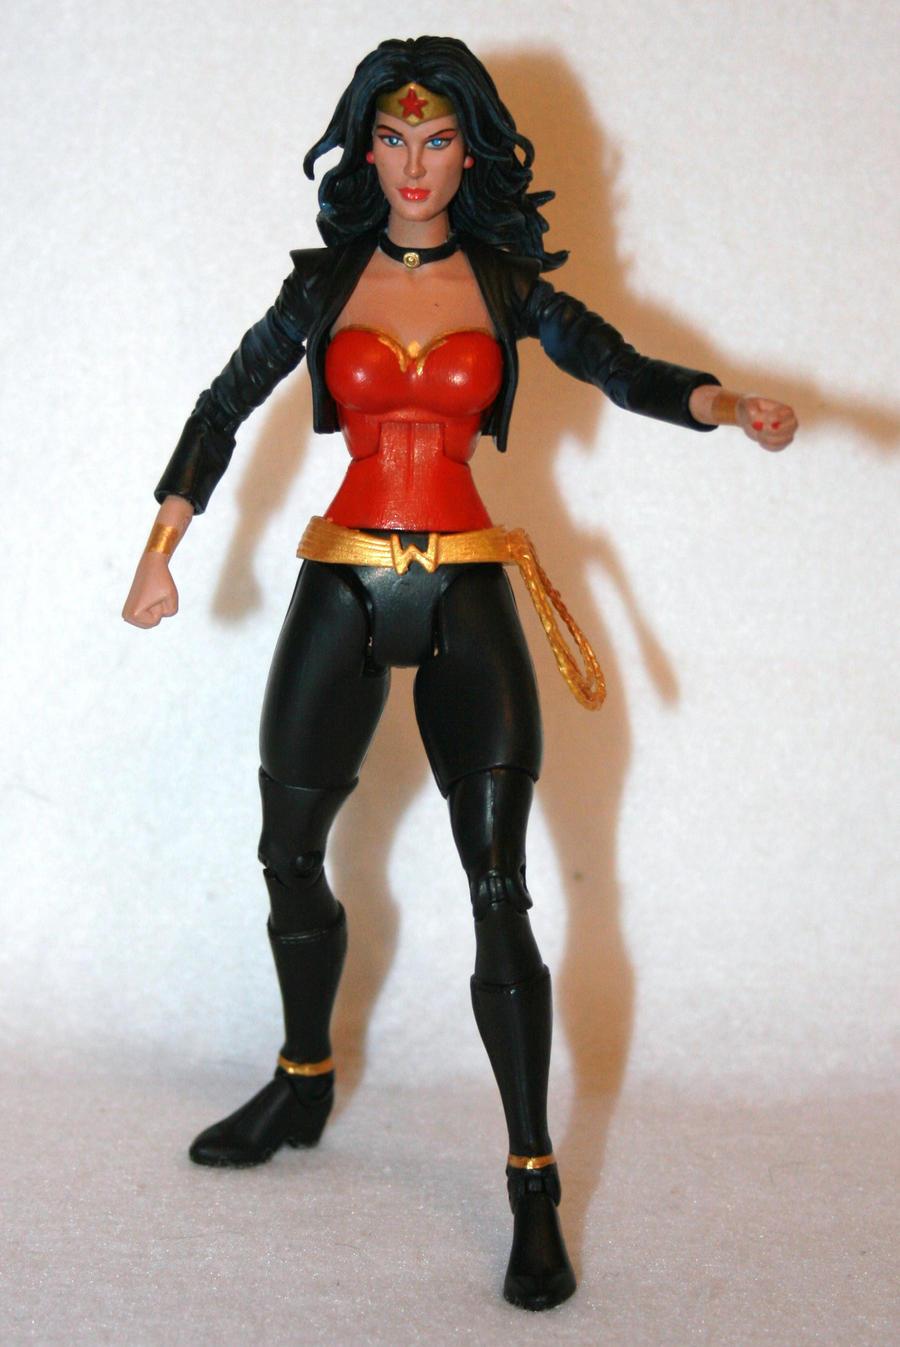 Wonder Woman New Costume Fig by erikrosario1 on DeviantArt